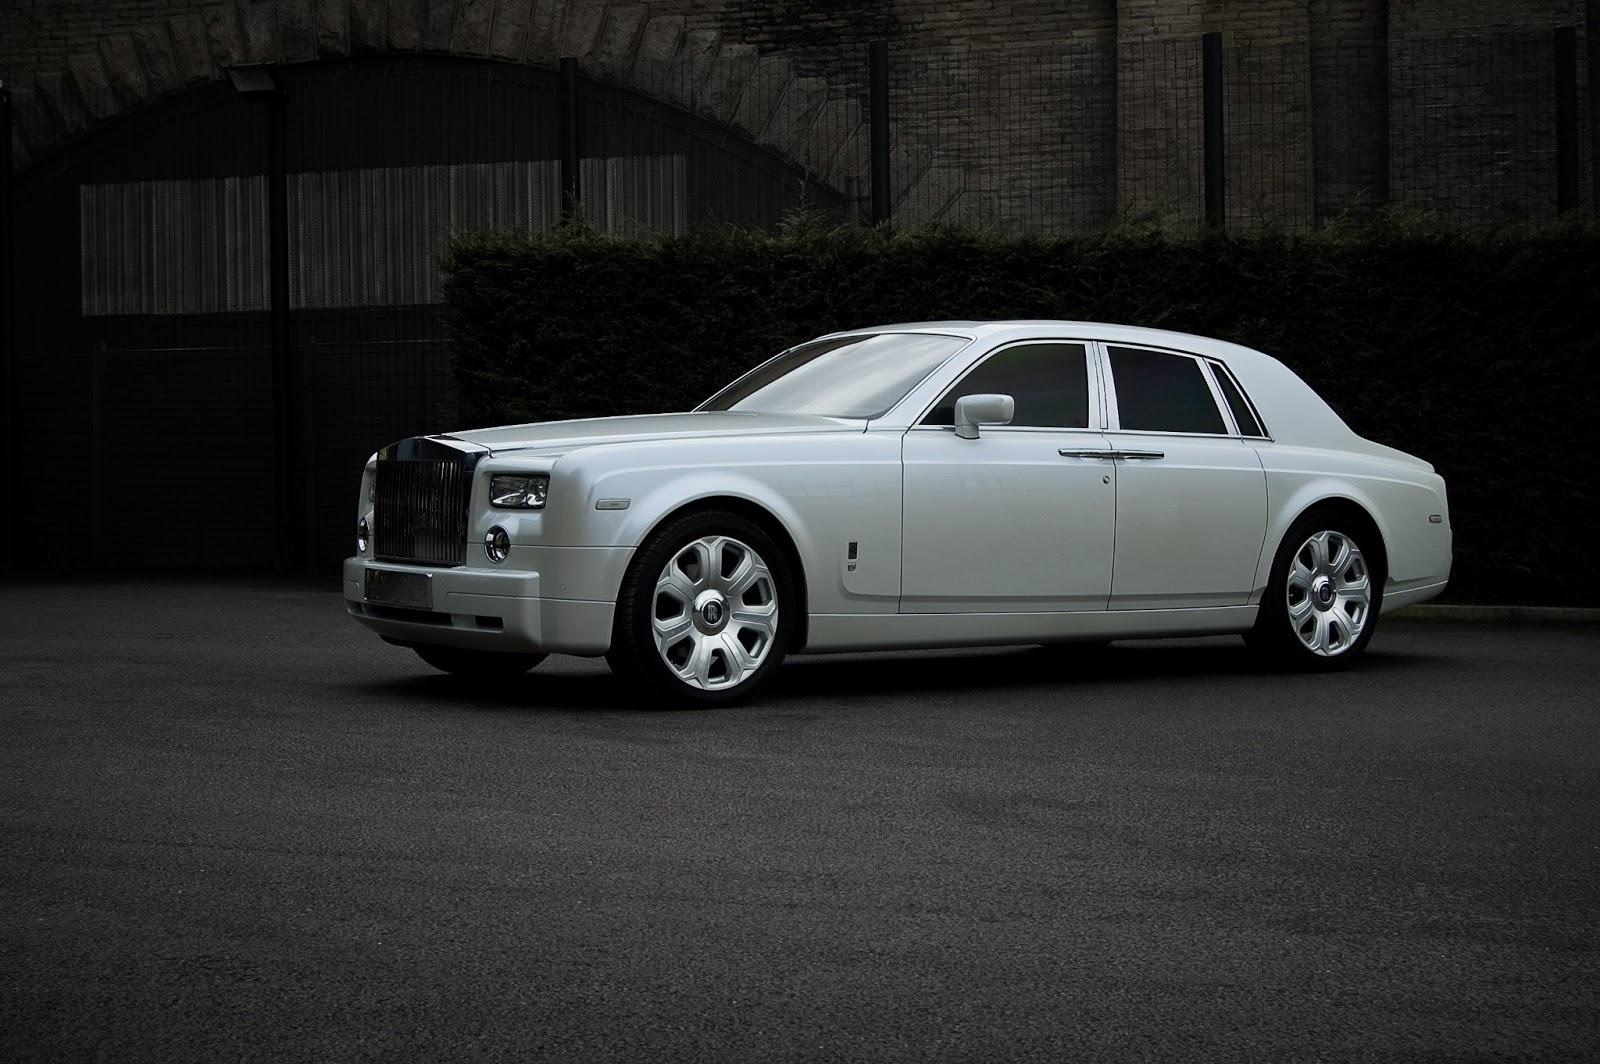 Cars GTO: Project Kahn Pearl White Rolls Royce Phantom